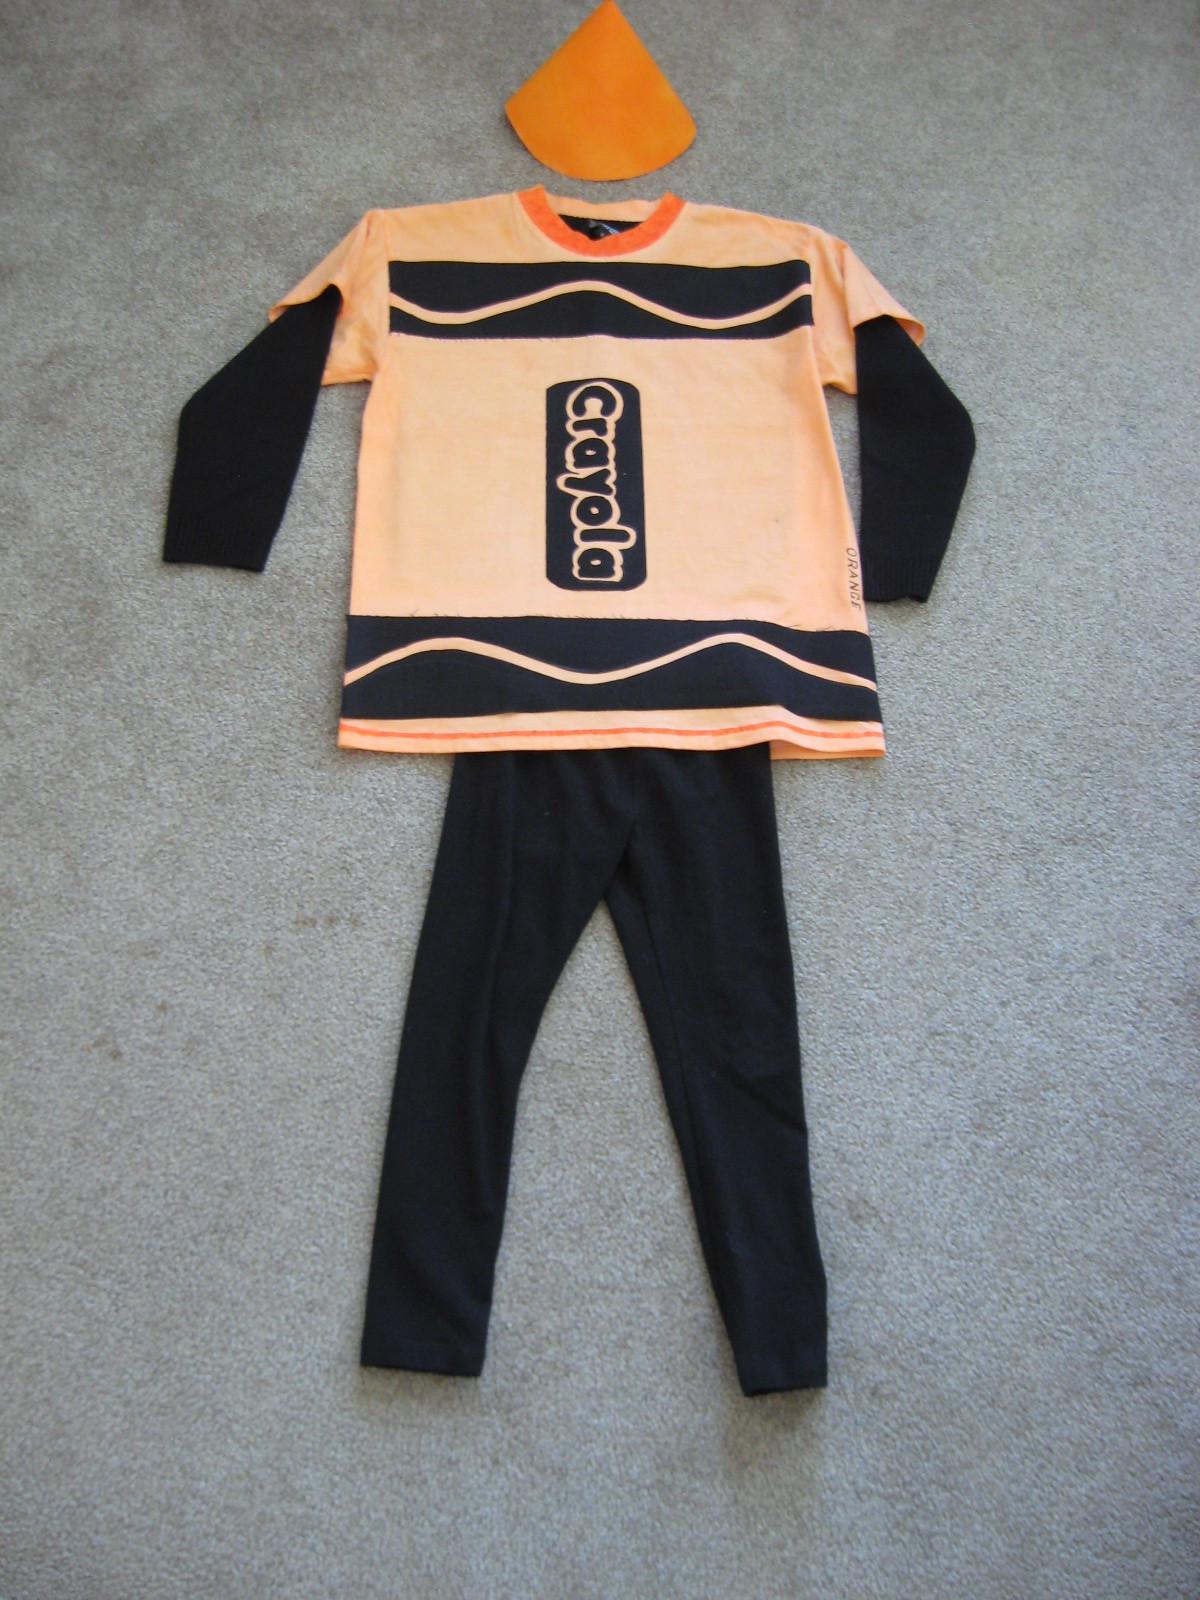 DIY Crayon Costume  Eclectic Studio DIY Crayon costume for Halloween